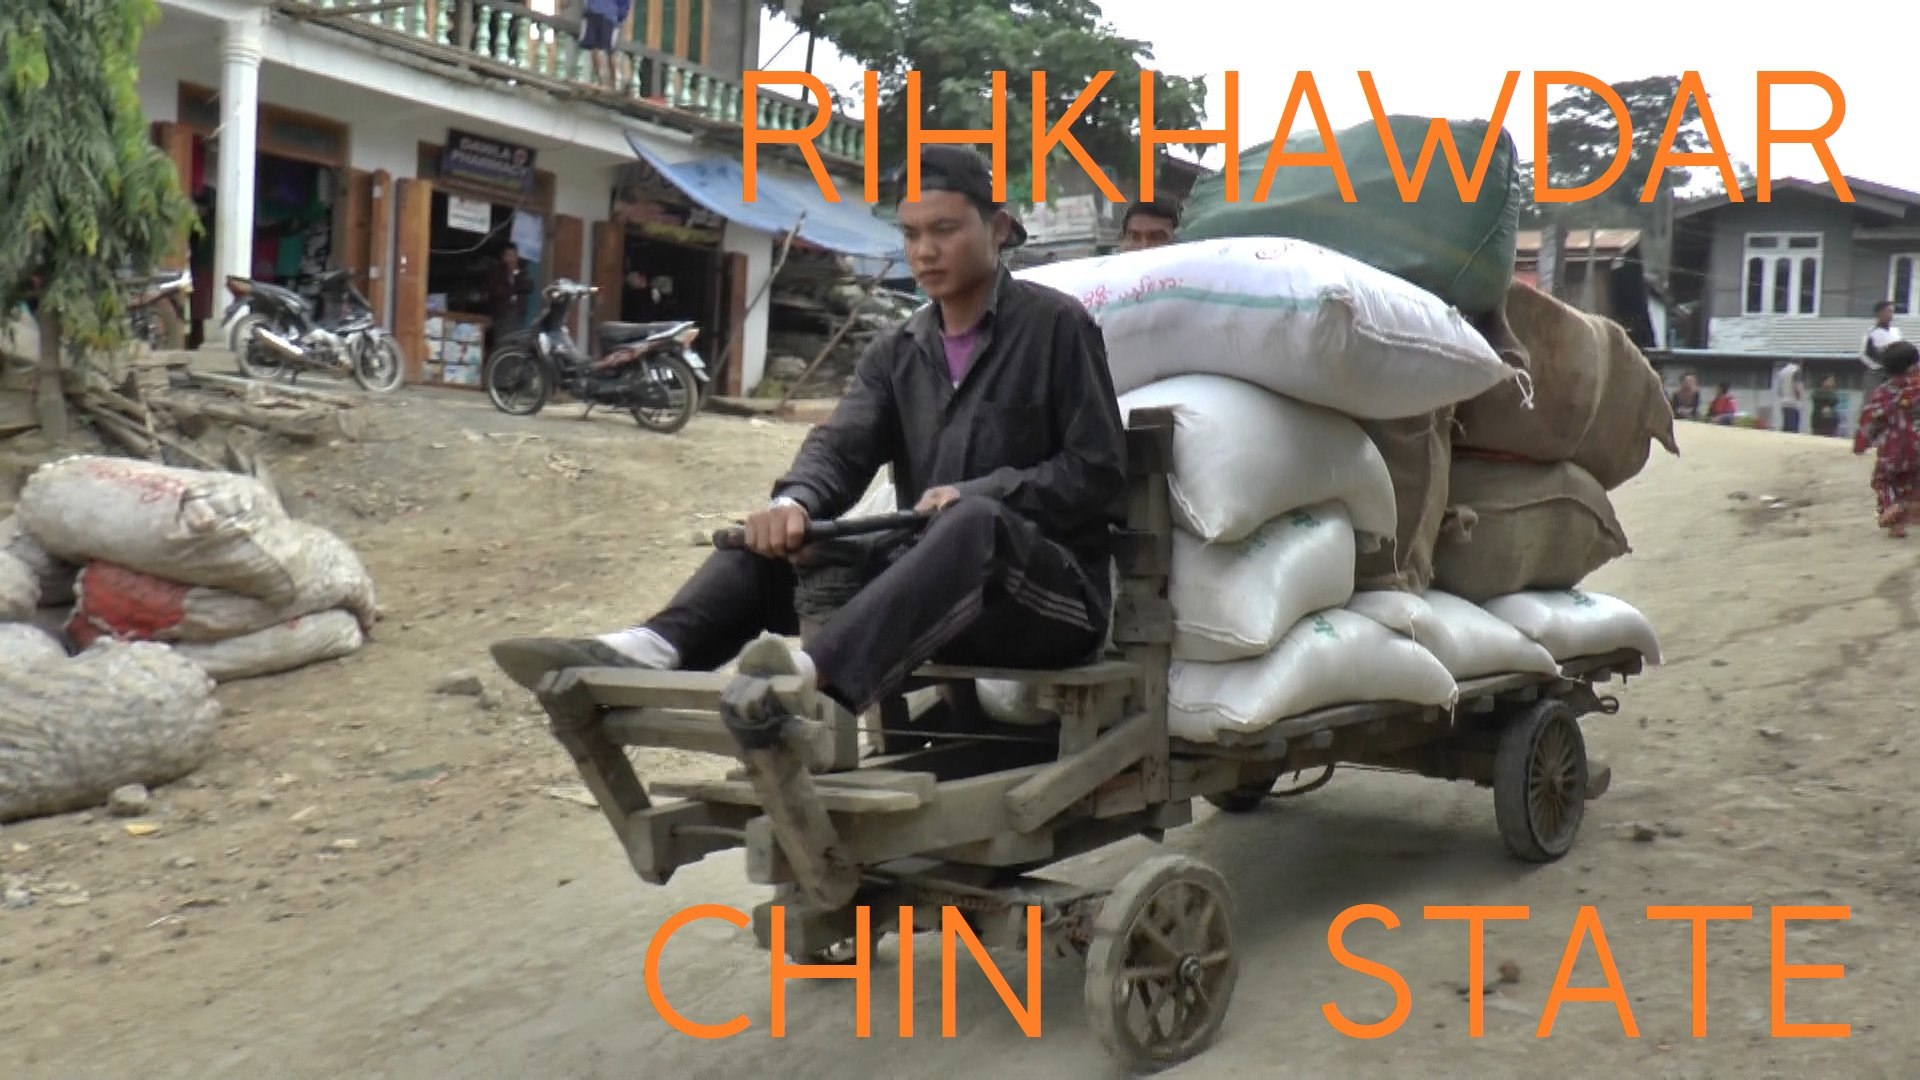 Rihkhawdar to Zokhawthar